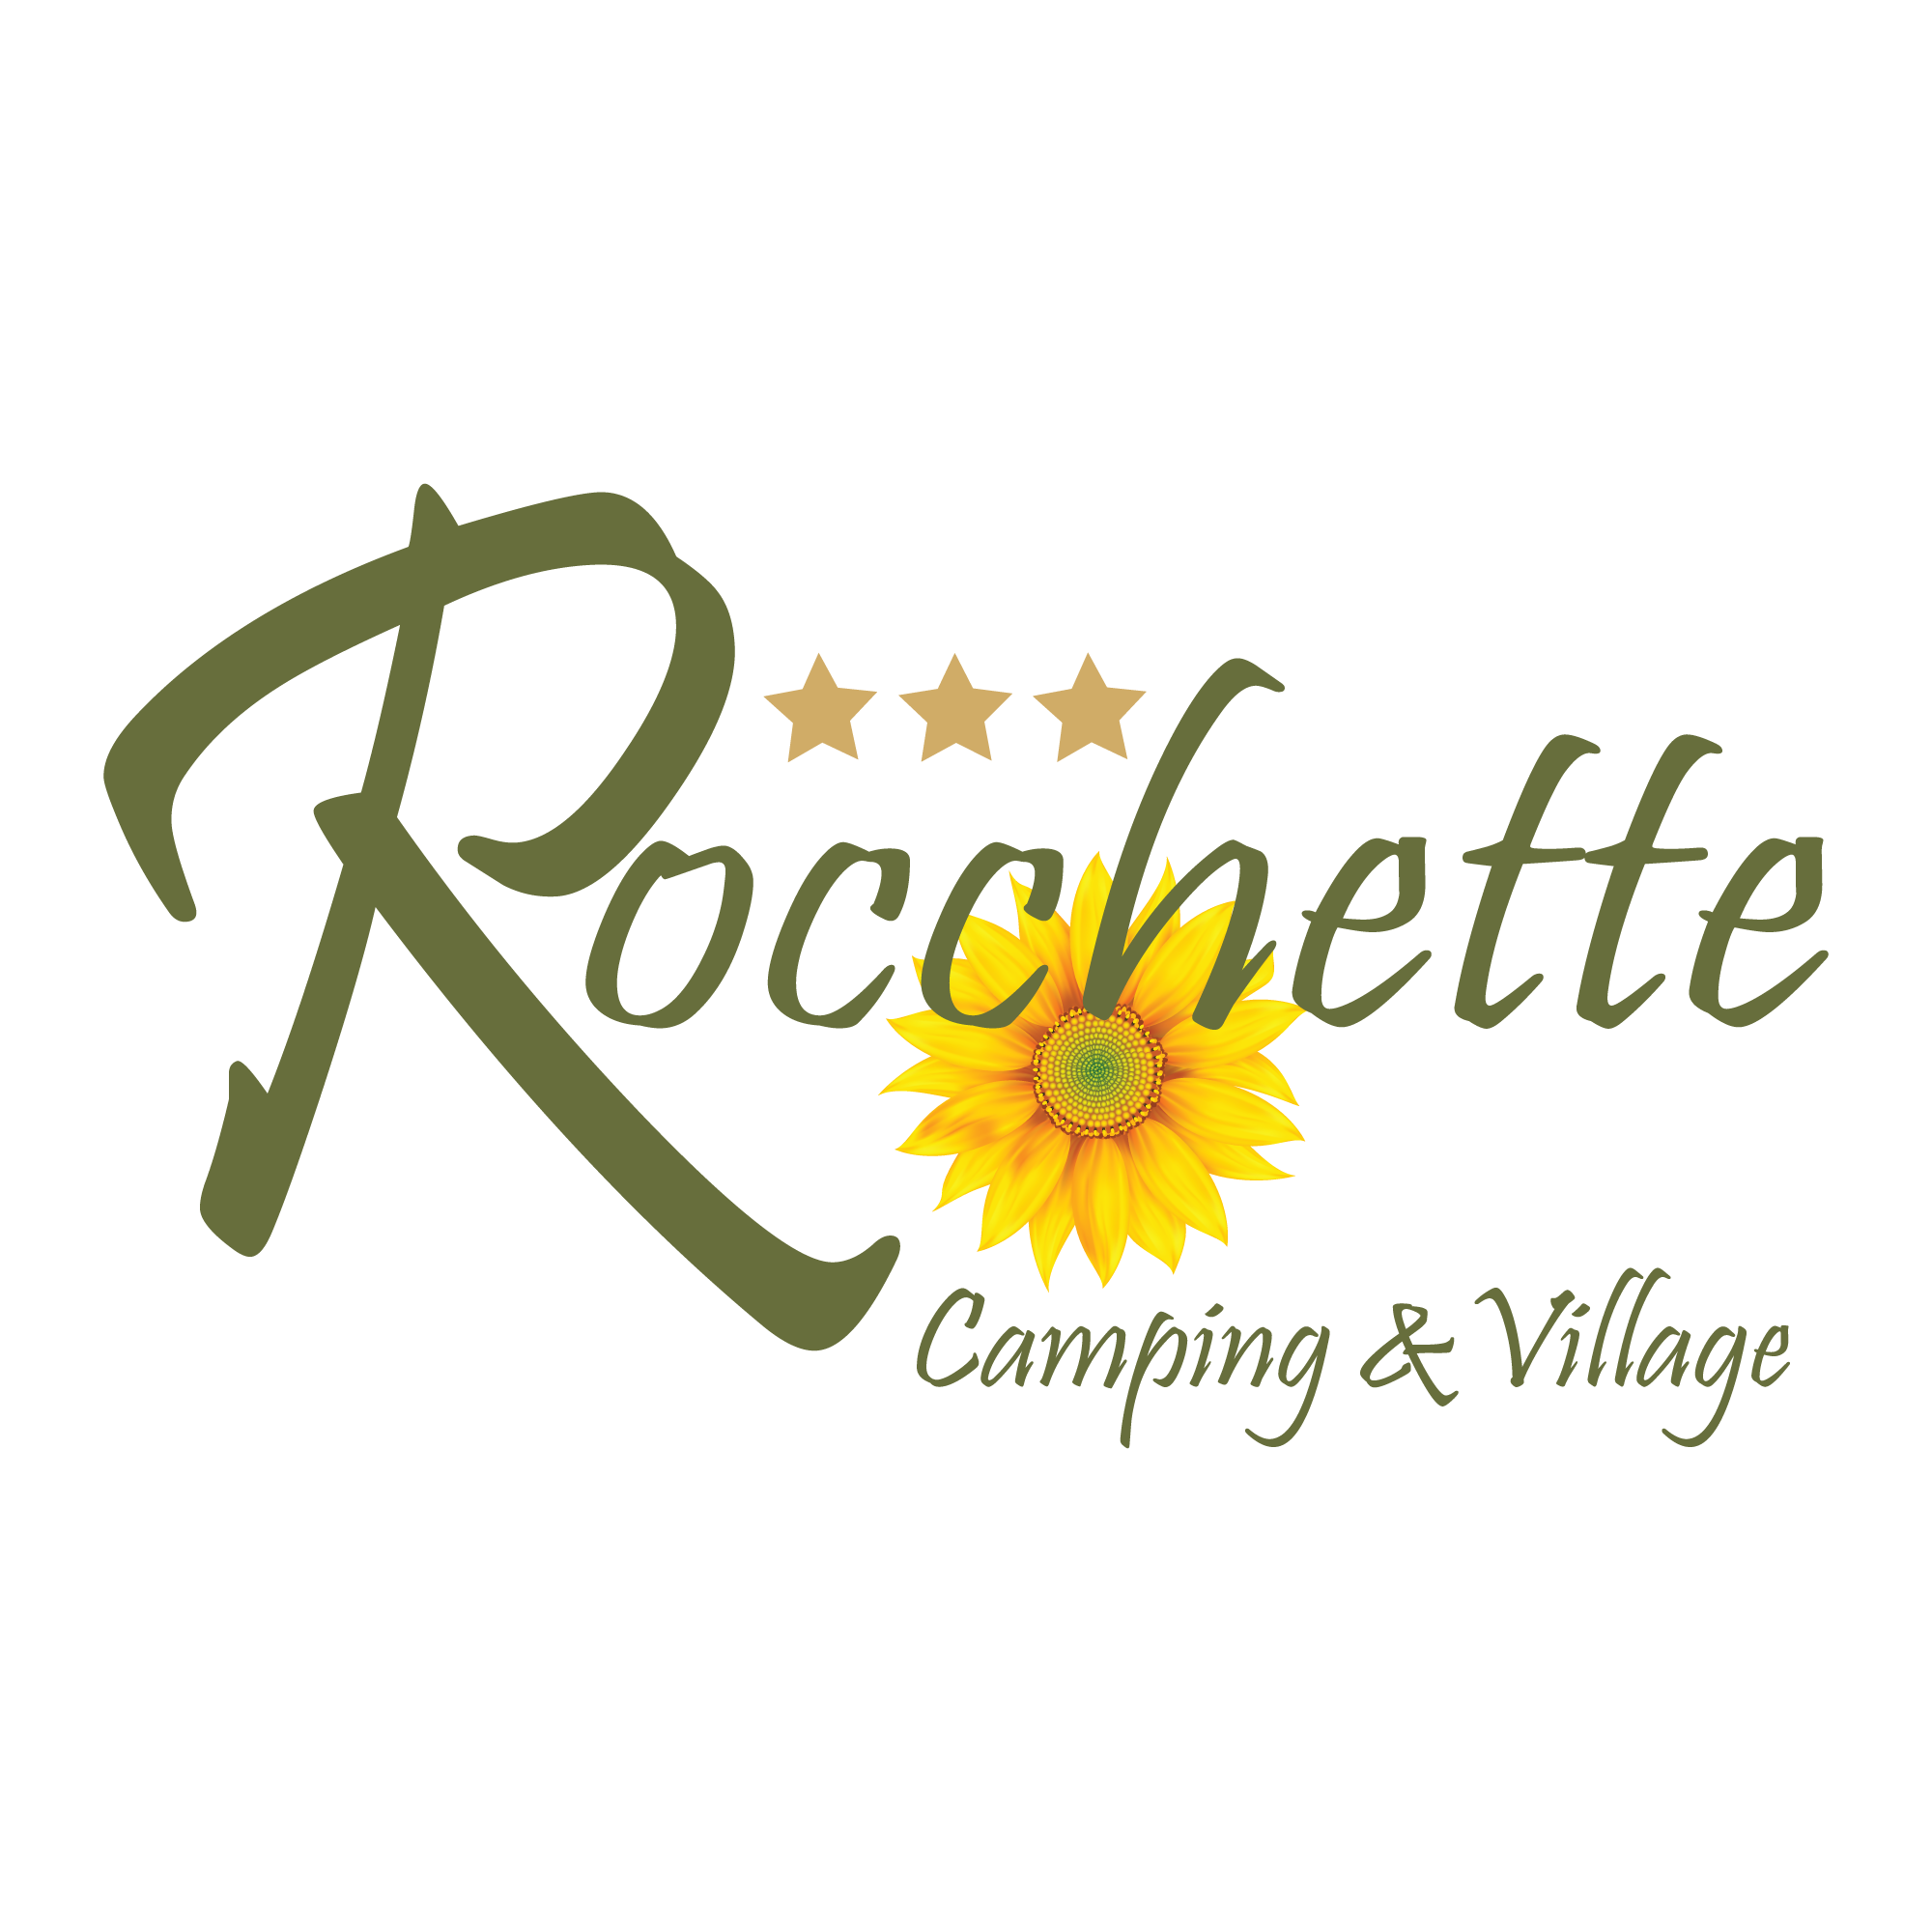 Rocchette Camping Village